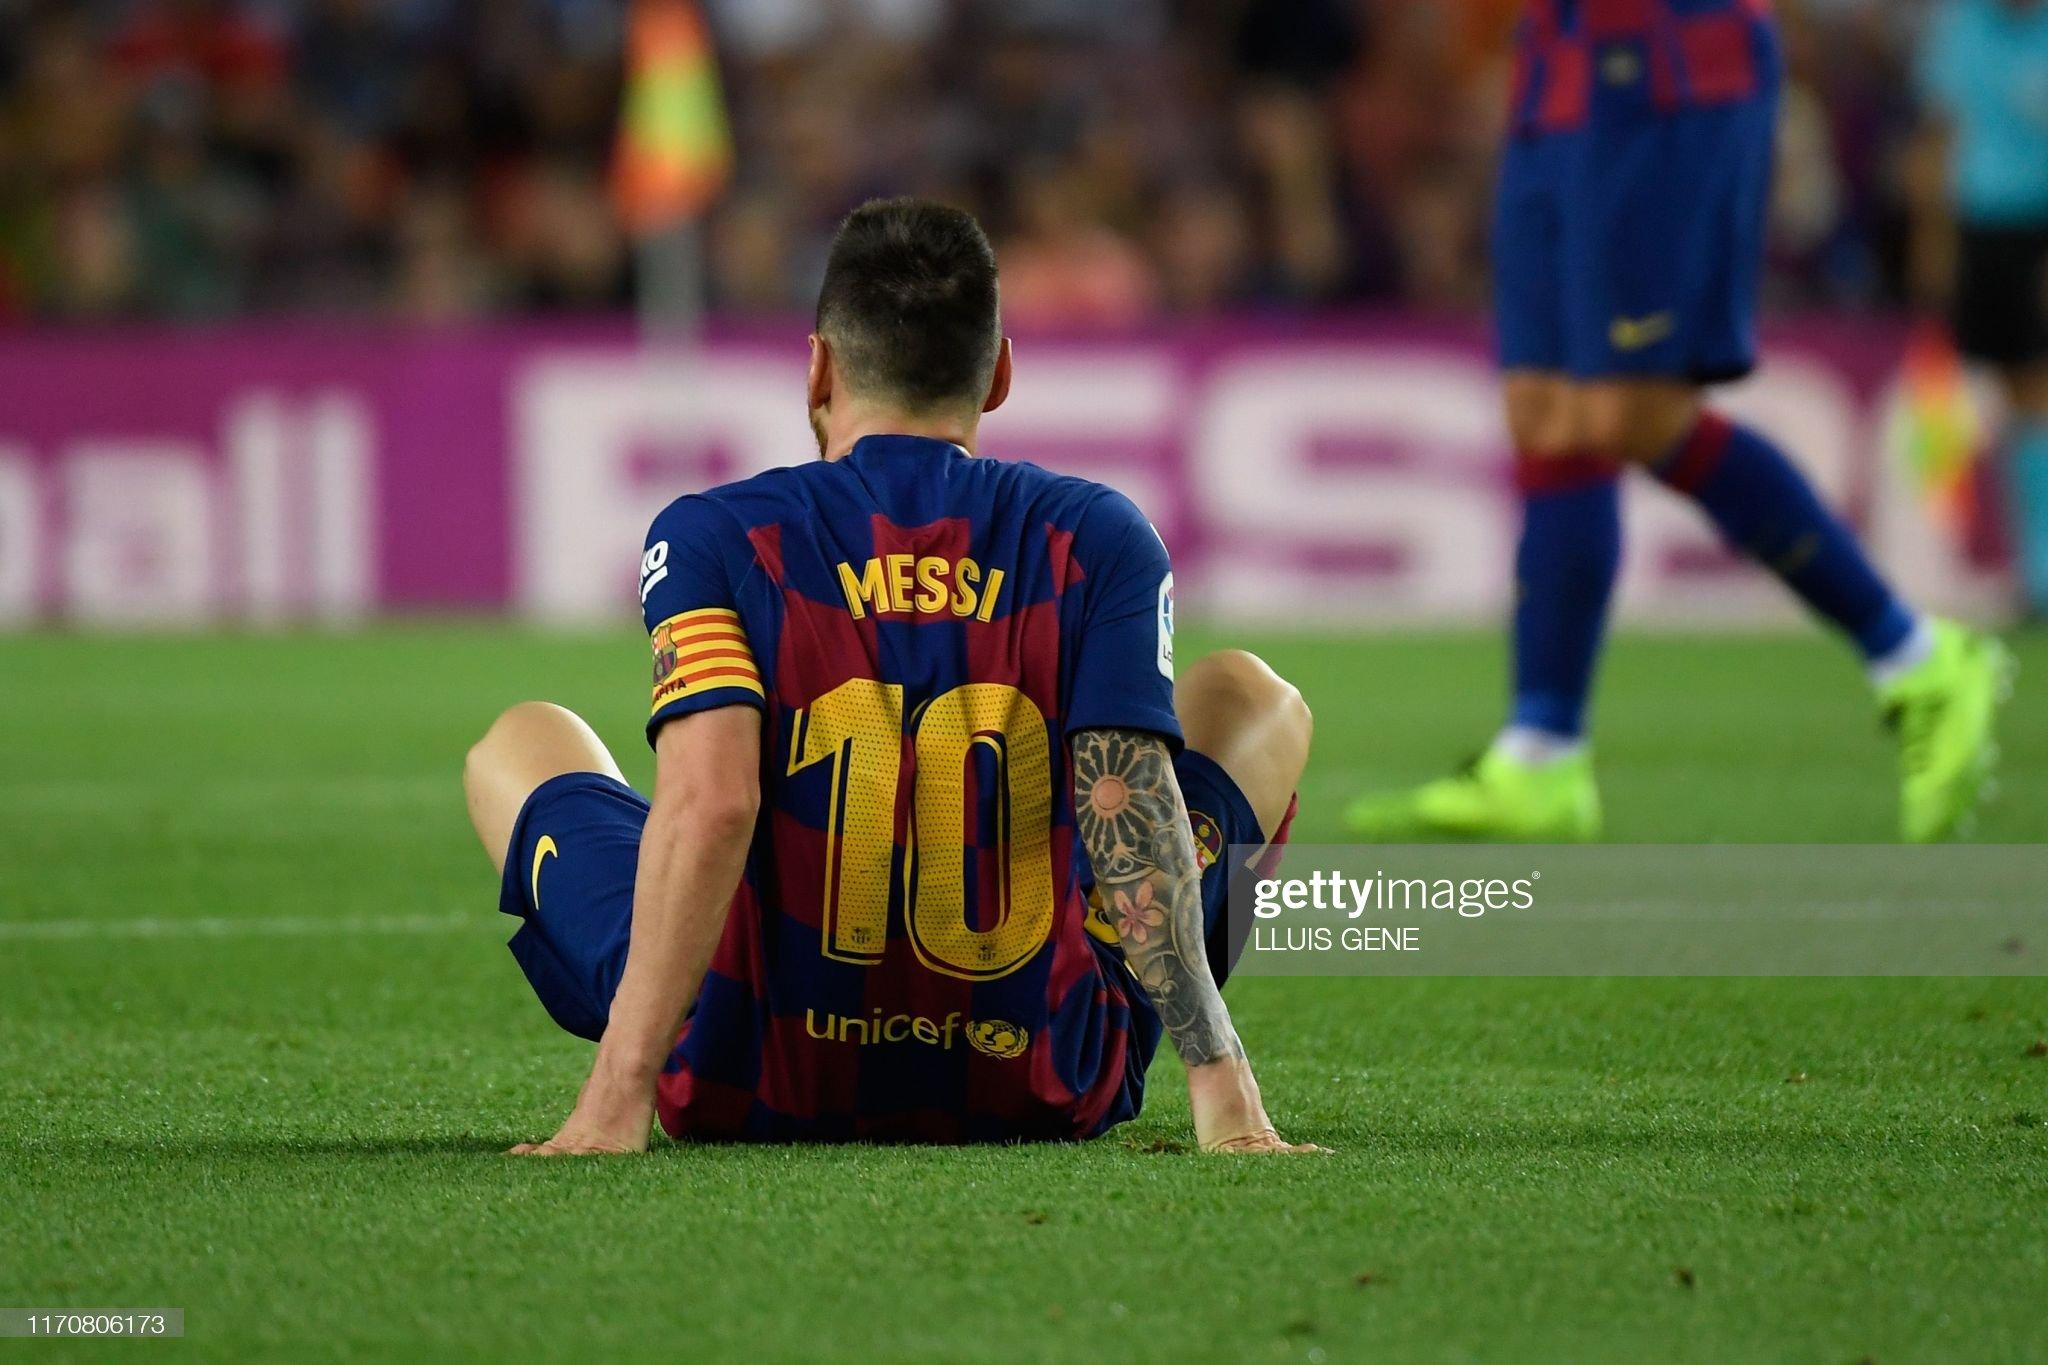 صور مباراة : برشلونة - فياريال 2-1 ( 24-09-2019 )  Barcelonas-argentine-forward-lionel-messi-reacts-on-the-ground-during-picture-id1170806173?s=2048x2048